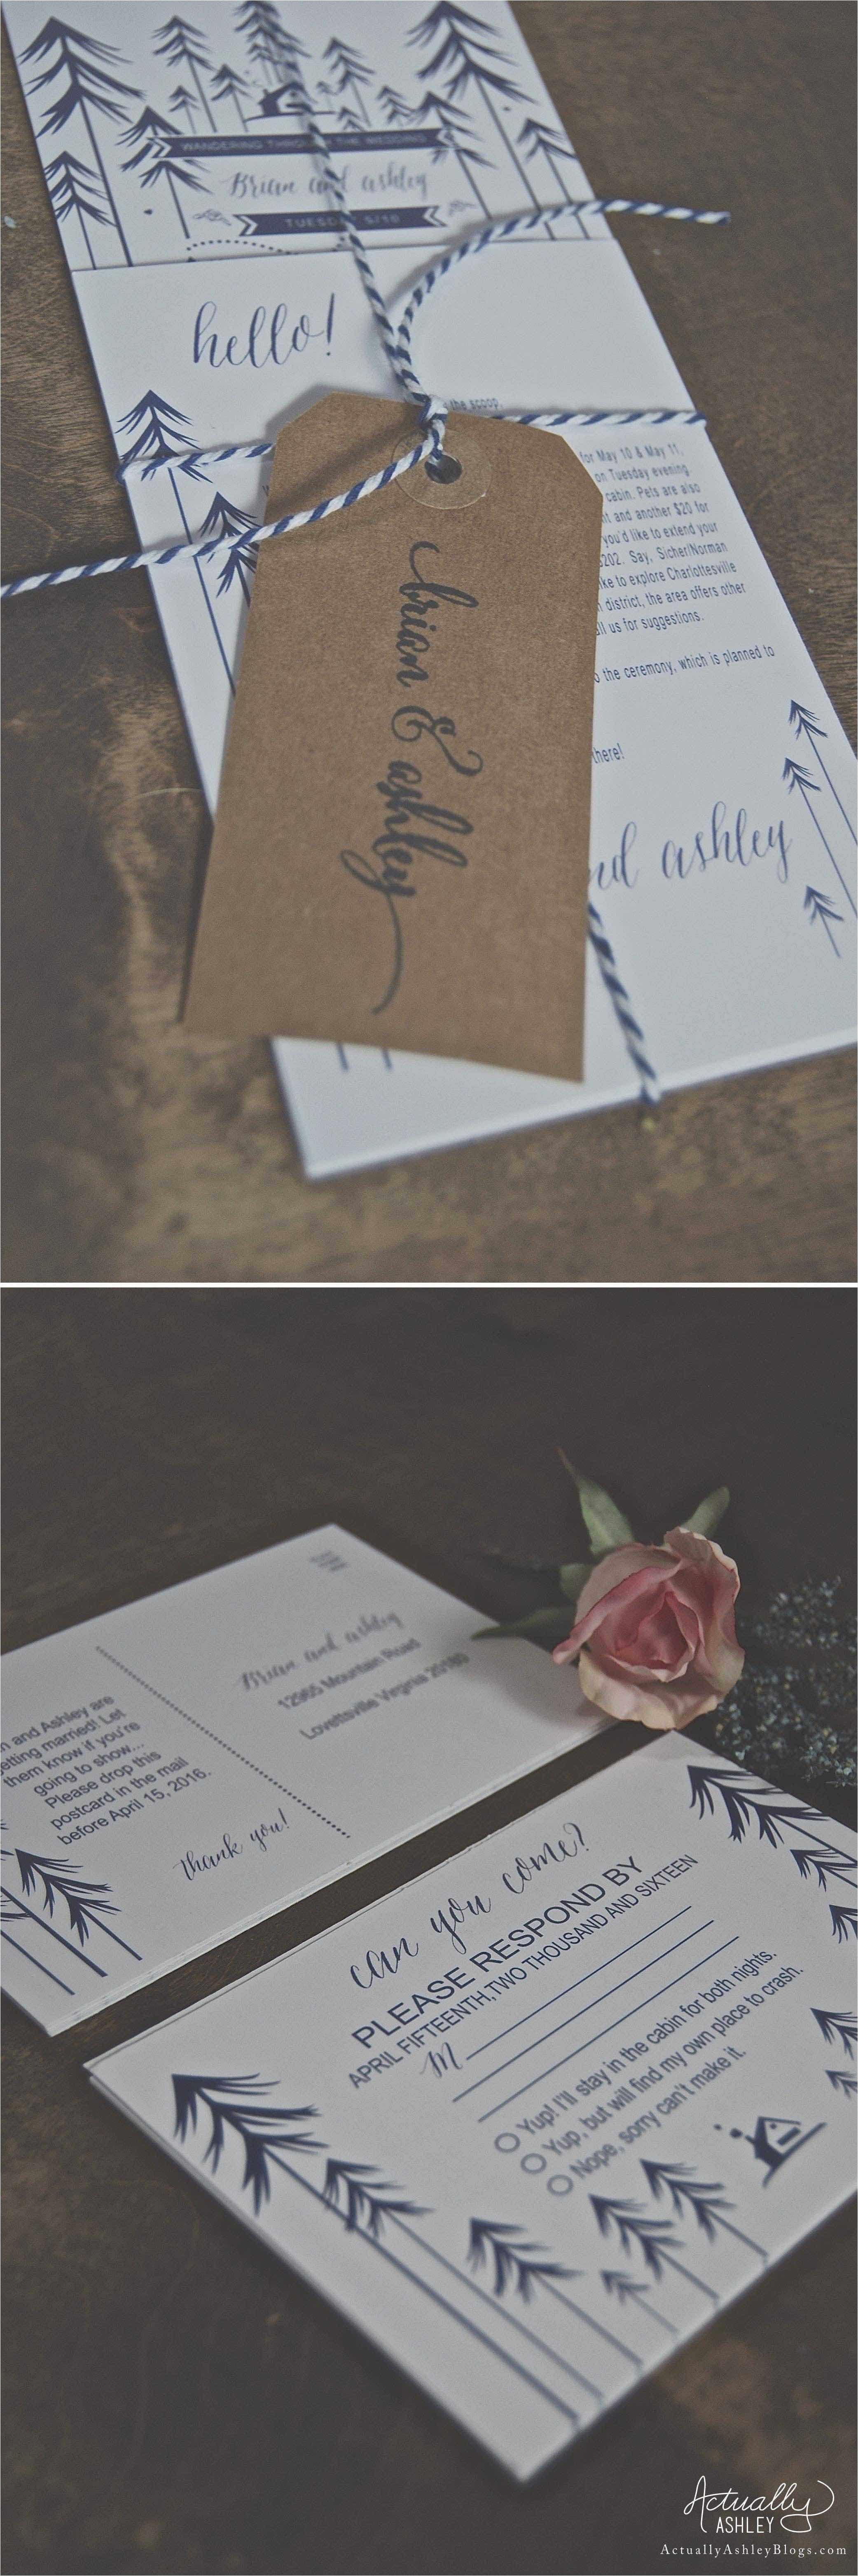 wedding planning camp theme wedding invitations